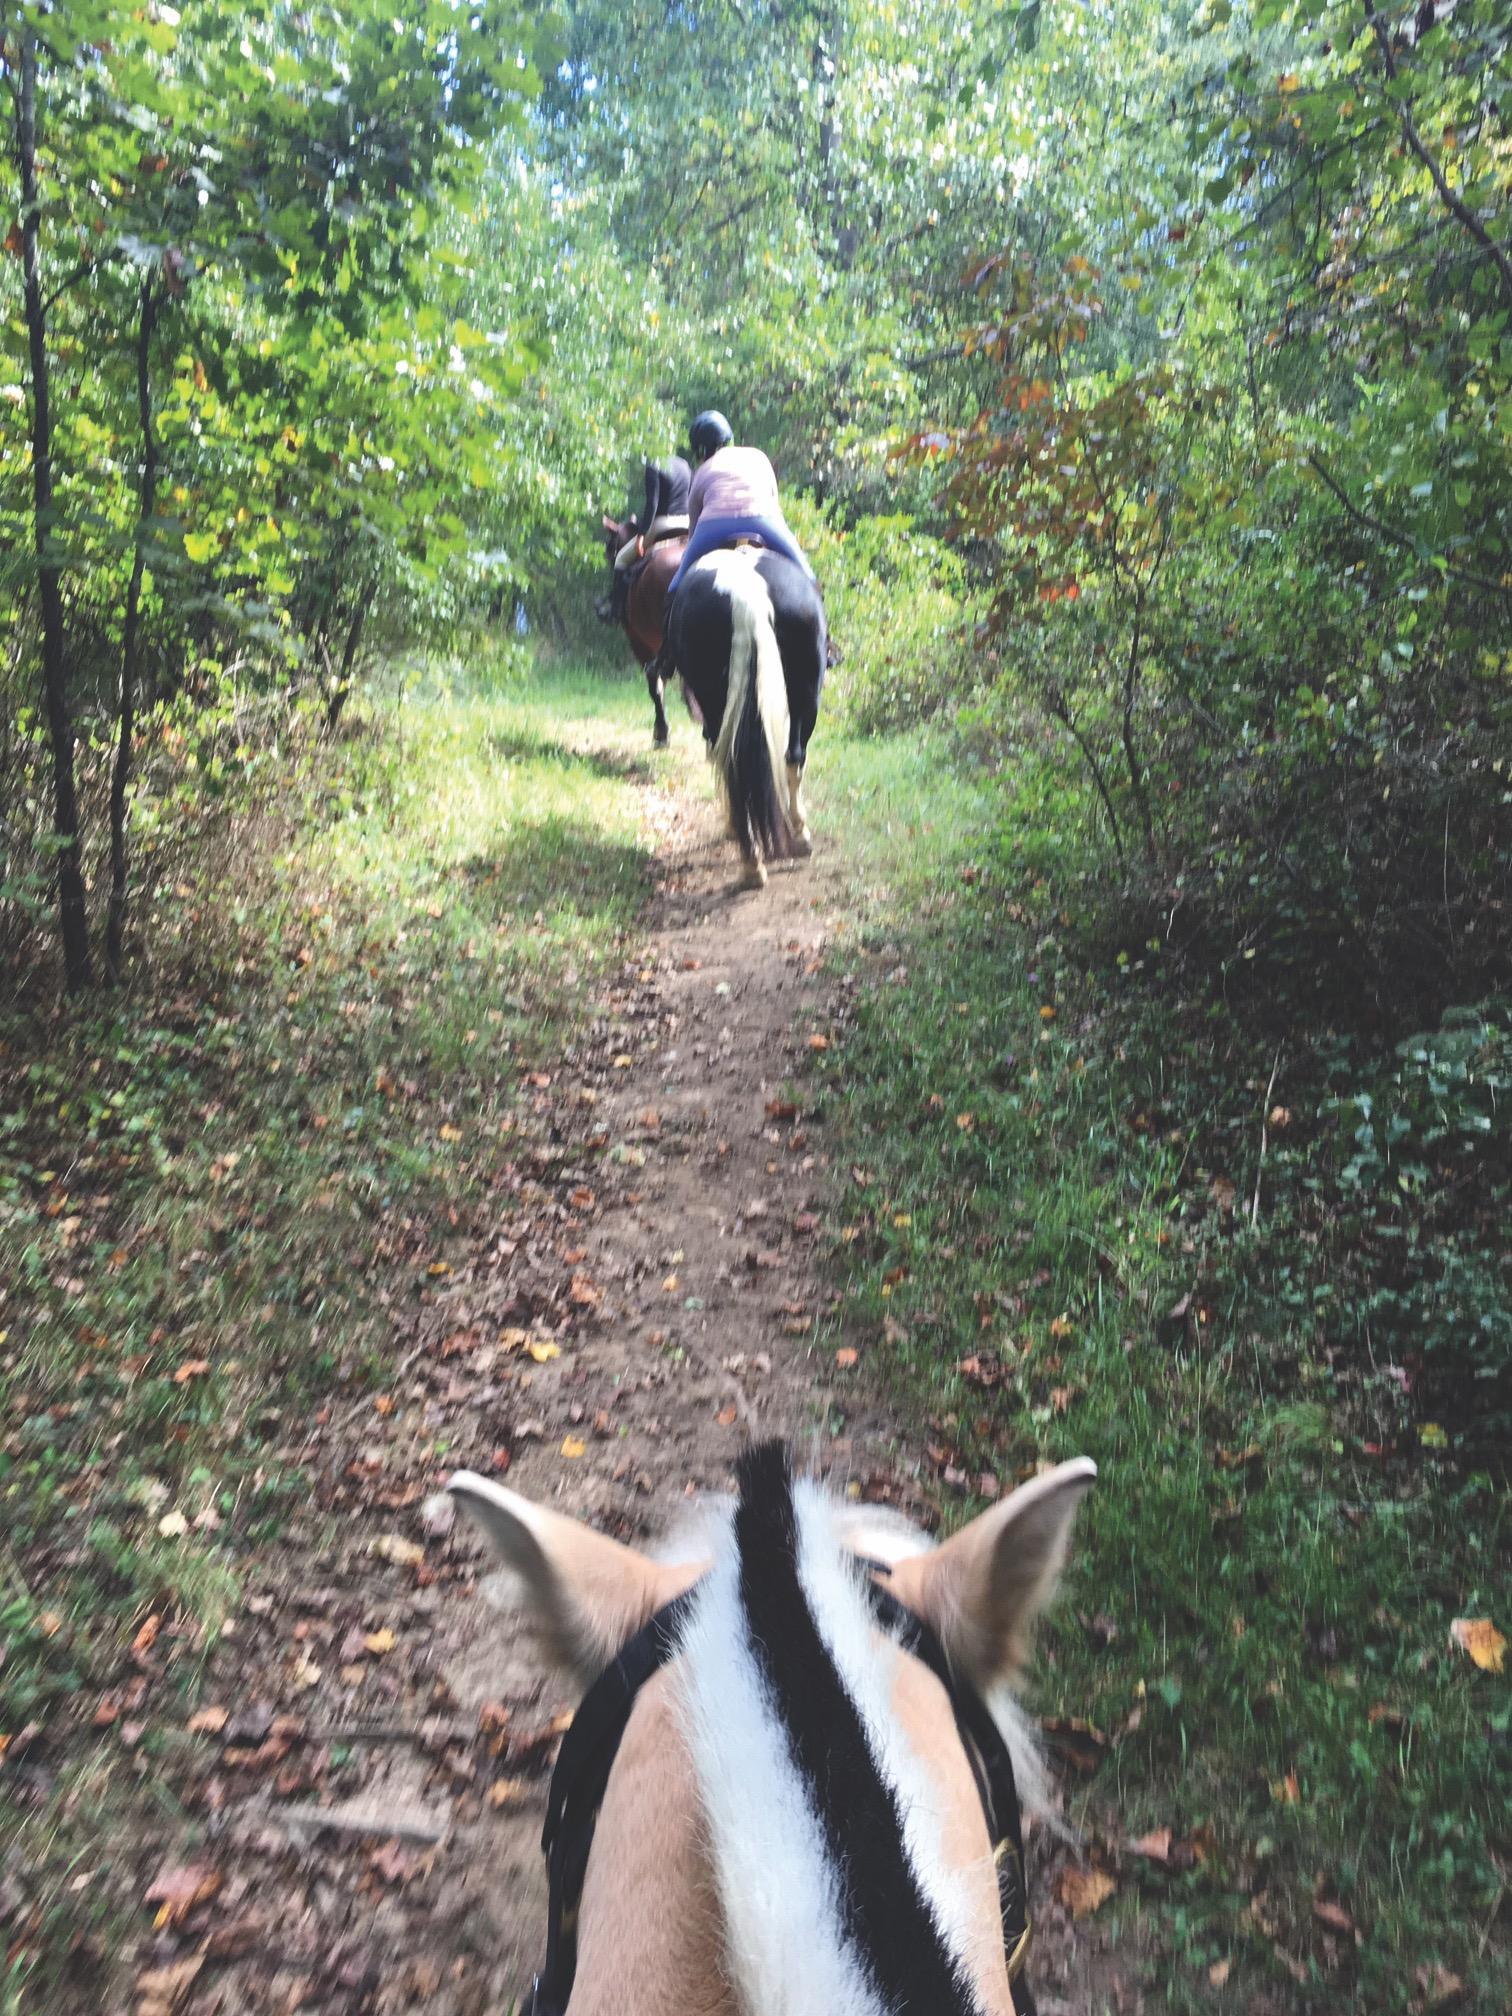 horeseback riding